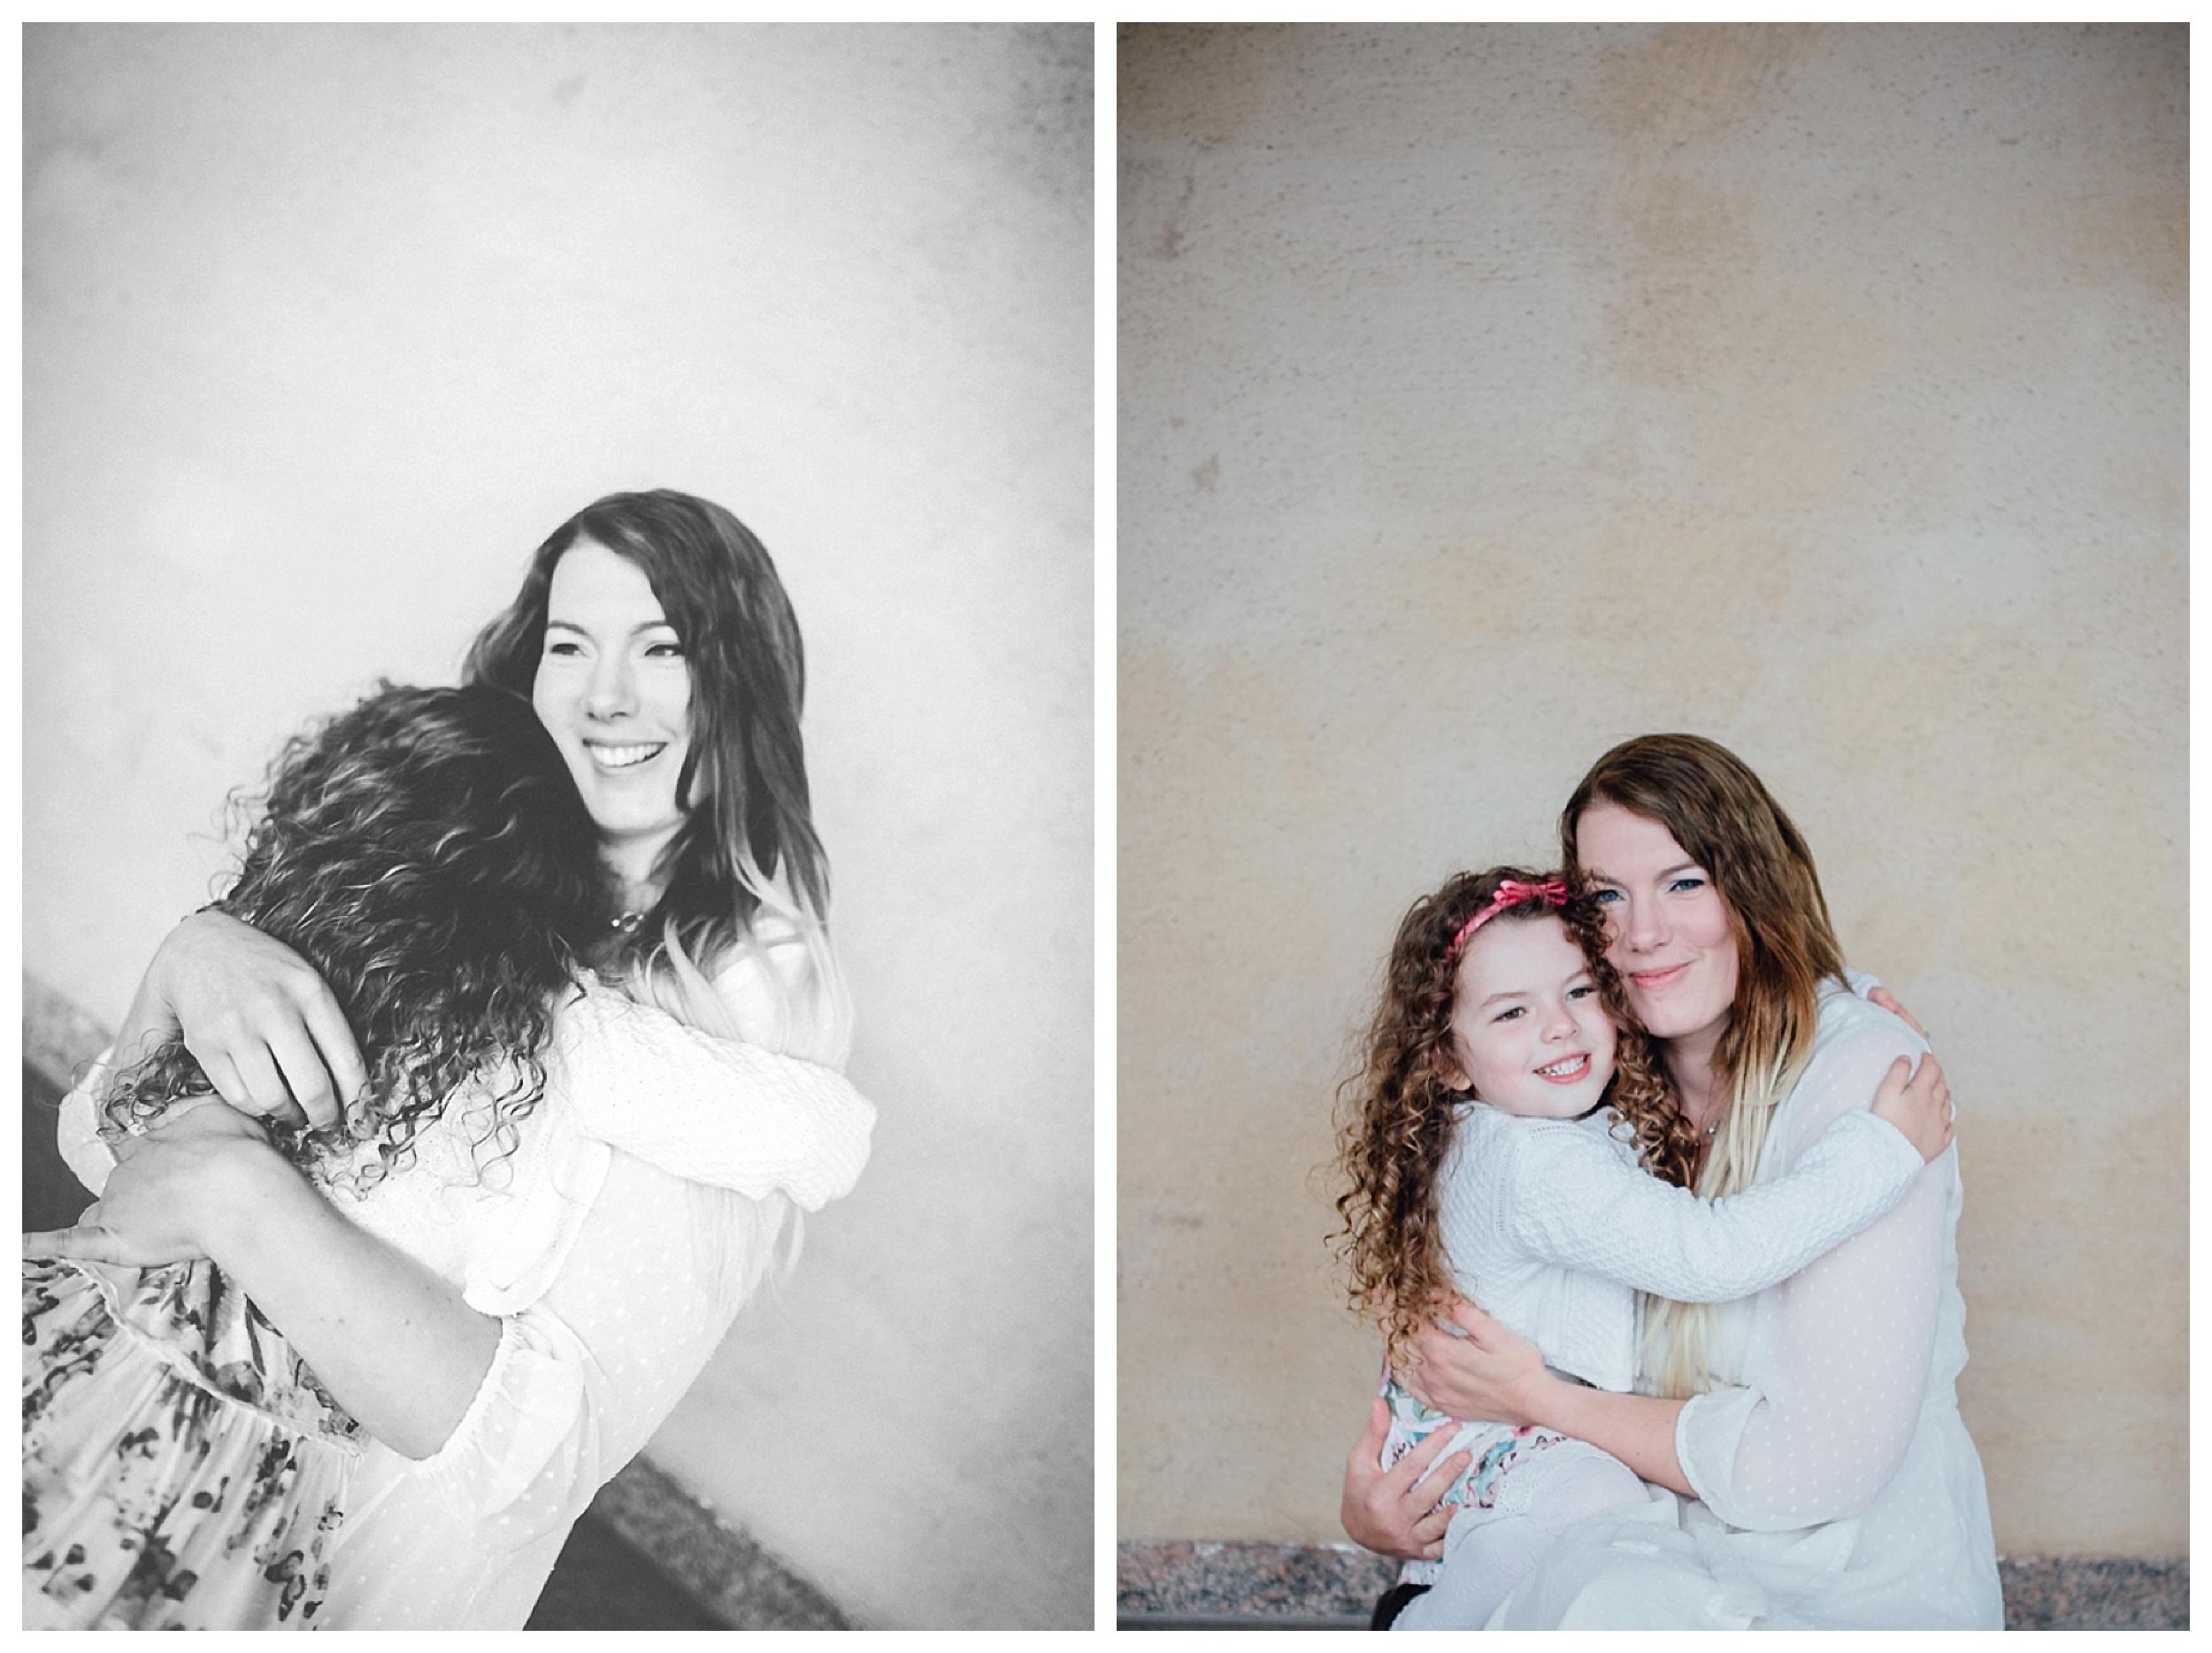 familjefotograf stockholm, familjefotograf vallentuna, familjefotograf täby, barnfotograf stockholm, familjebilder, familjefotografering stockholm, studiofotograf, linda rehlin, cecilia pihl